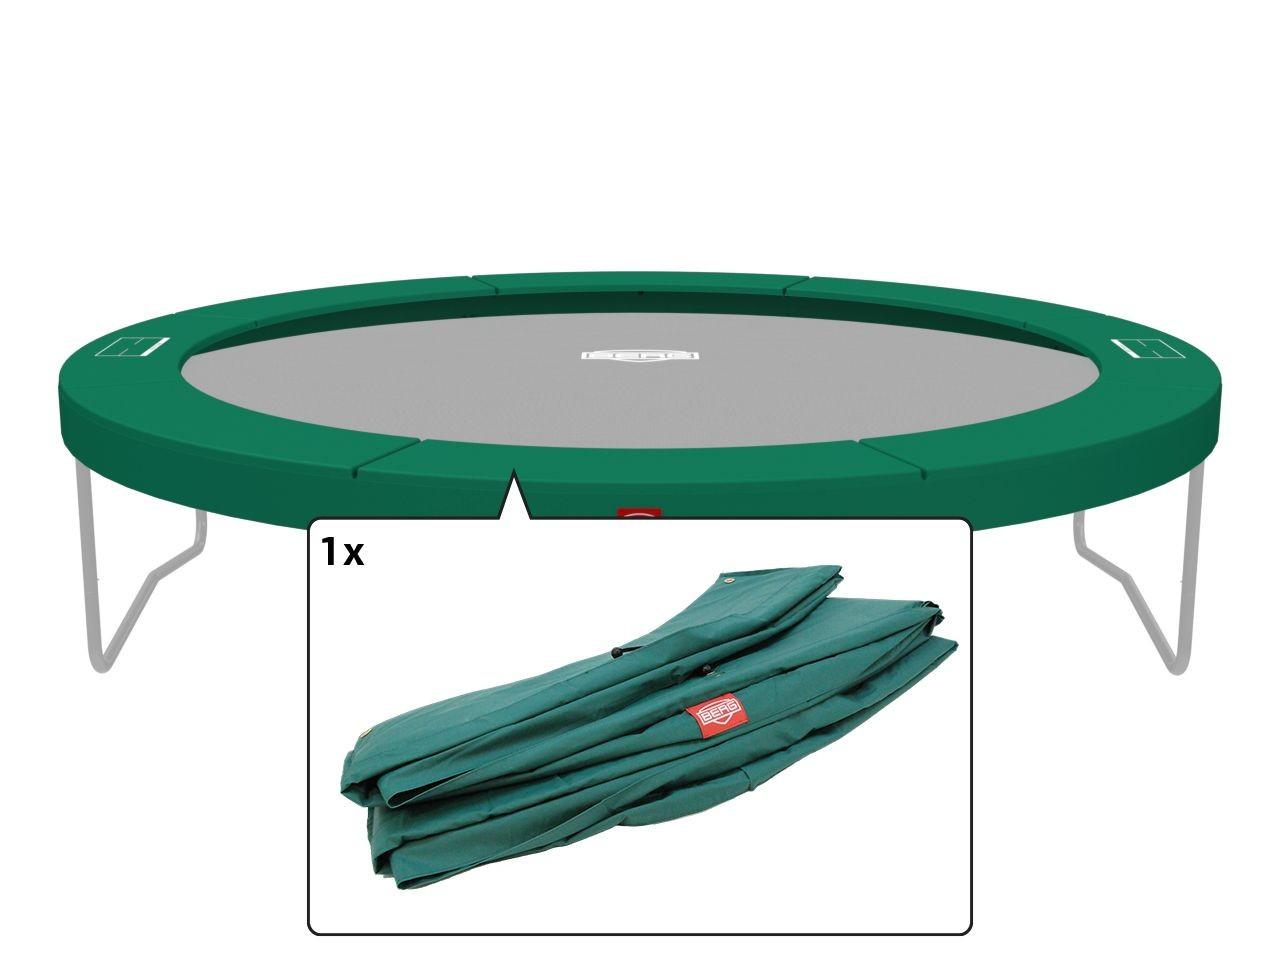 Champion - Padding green 270 (9ft)